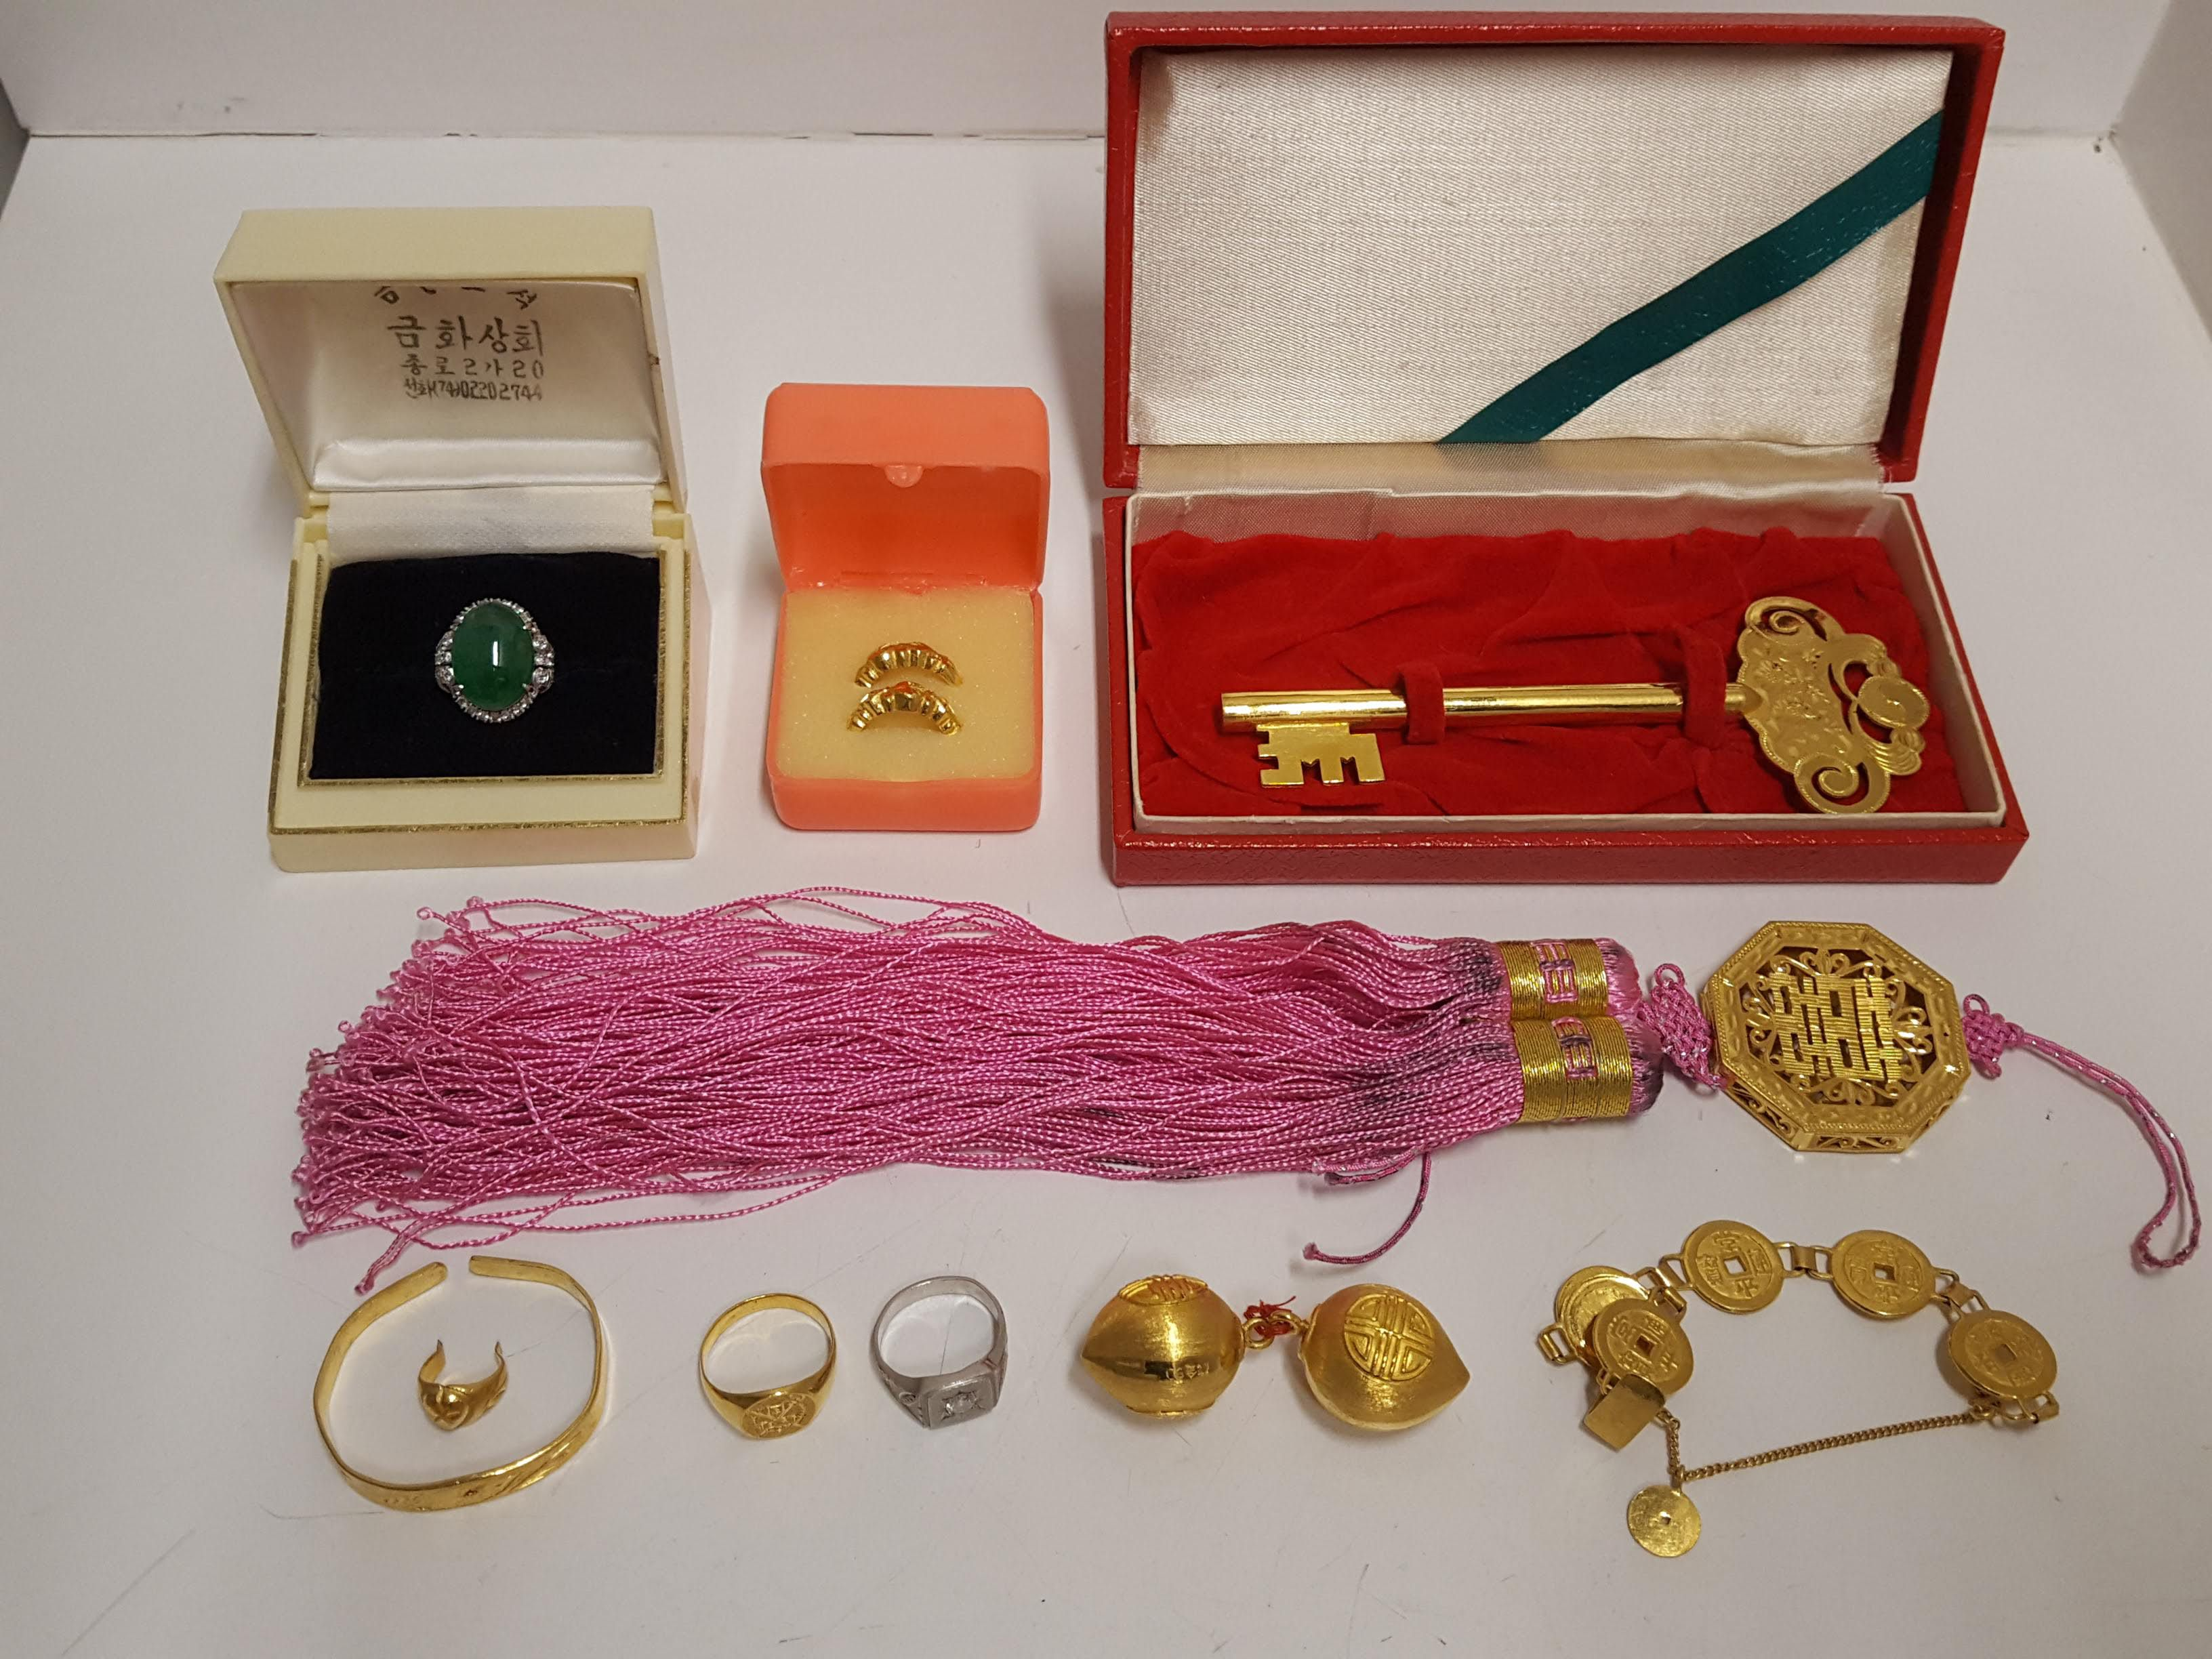 Can you help? Irreplaceable family heirlooms stolen from elderly couple in metro Atlanta